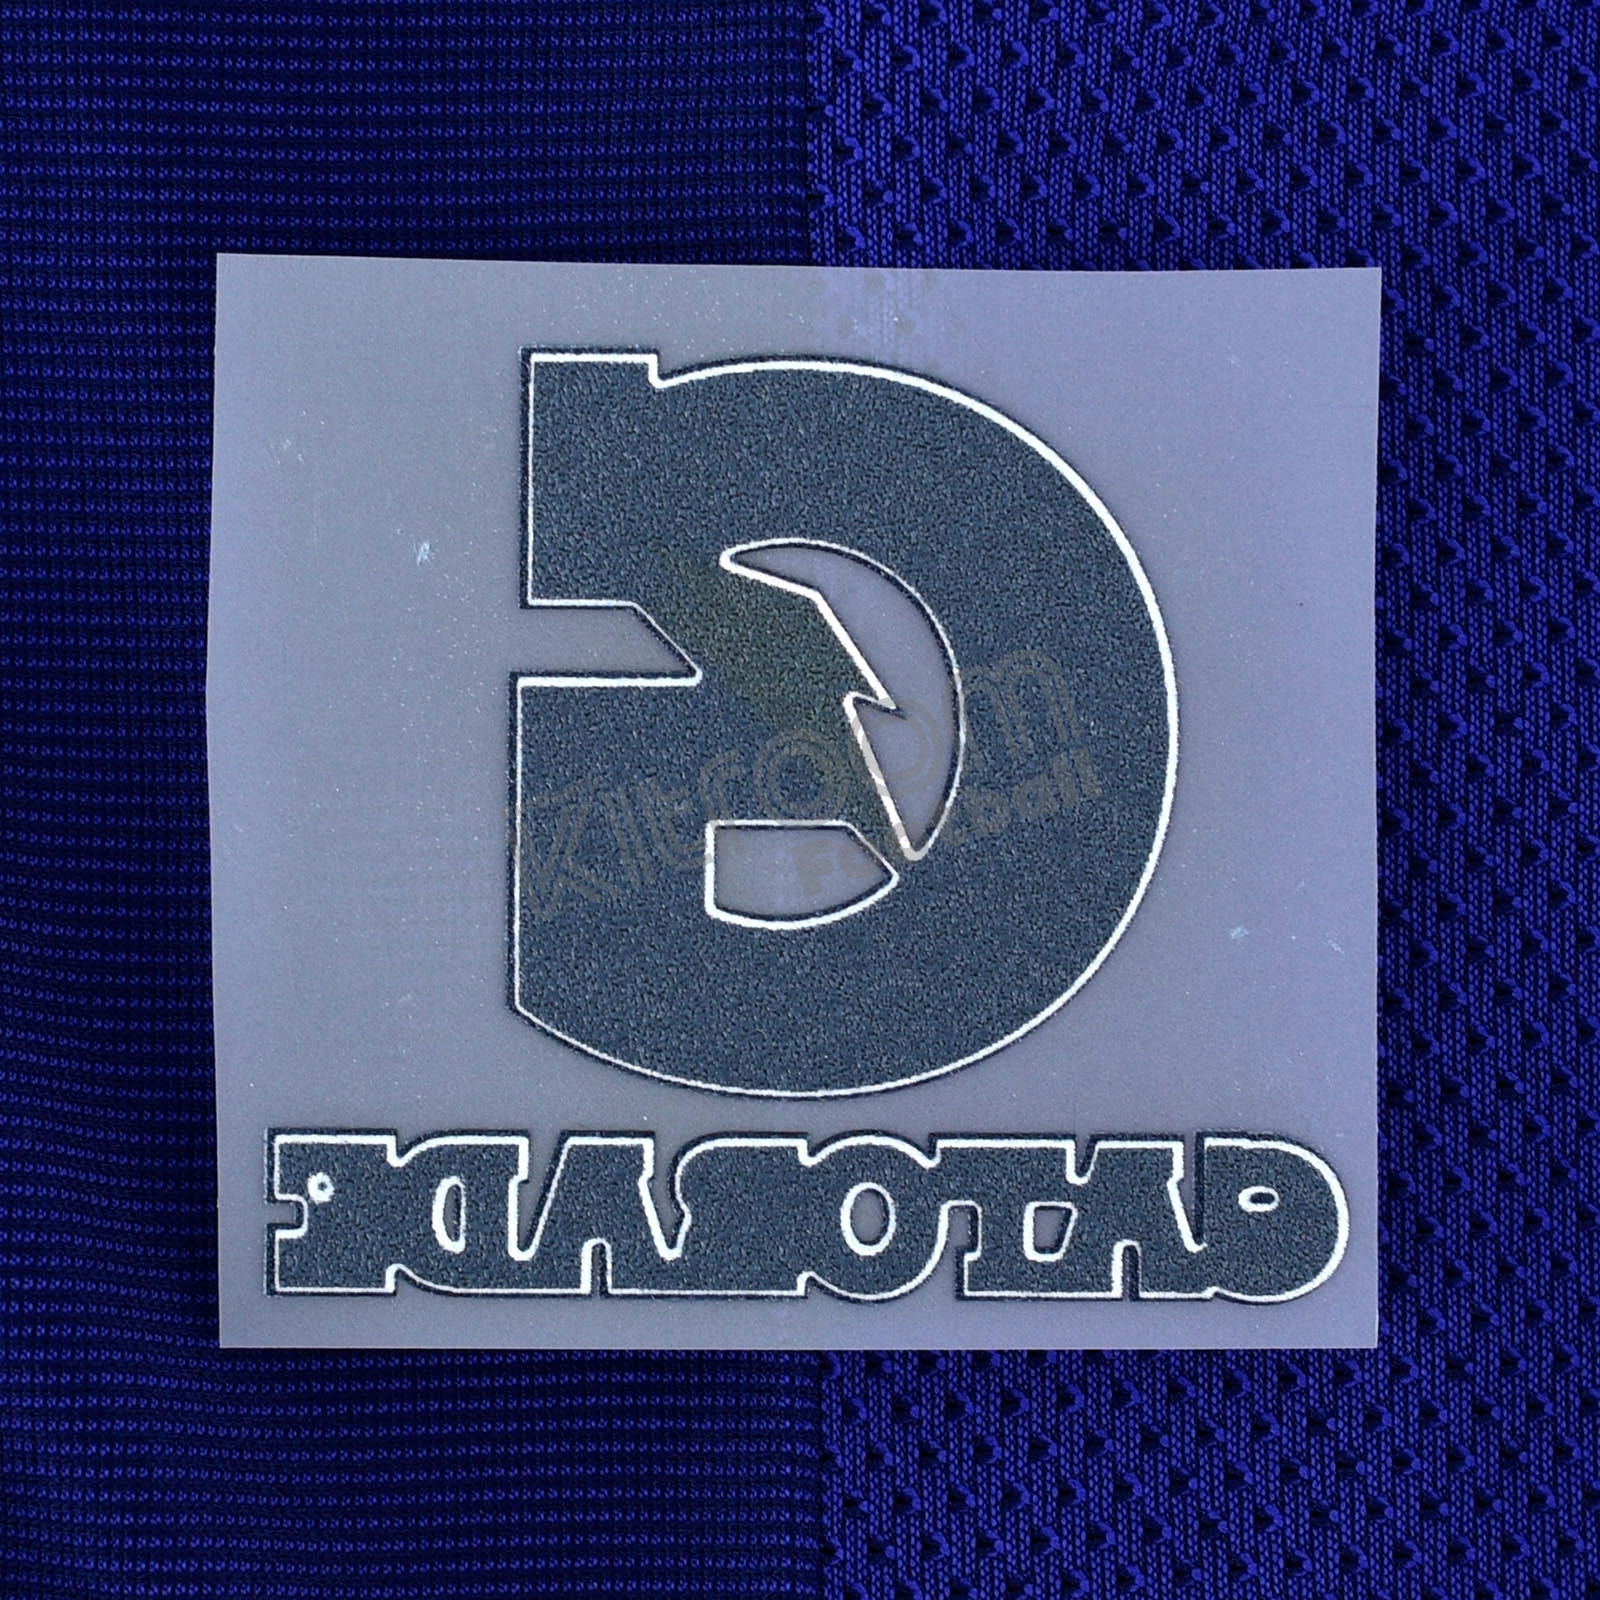 2014-16 barcelona preseason gatorade away player issue patch.